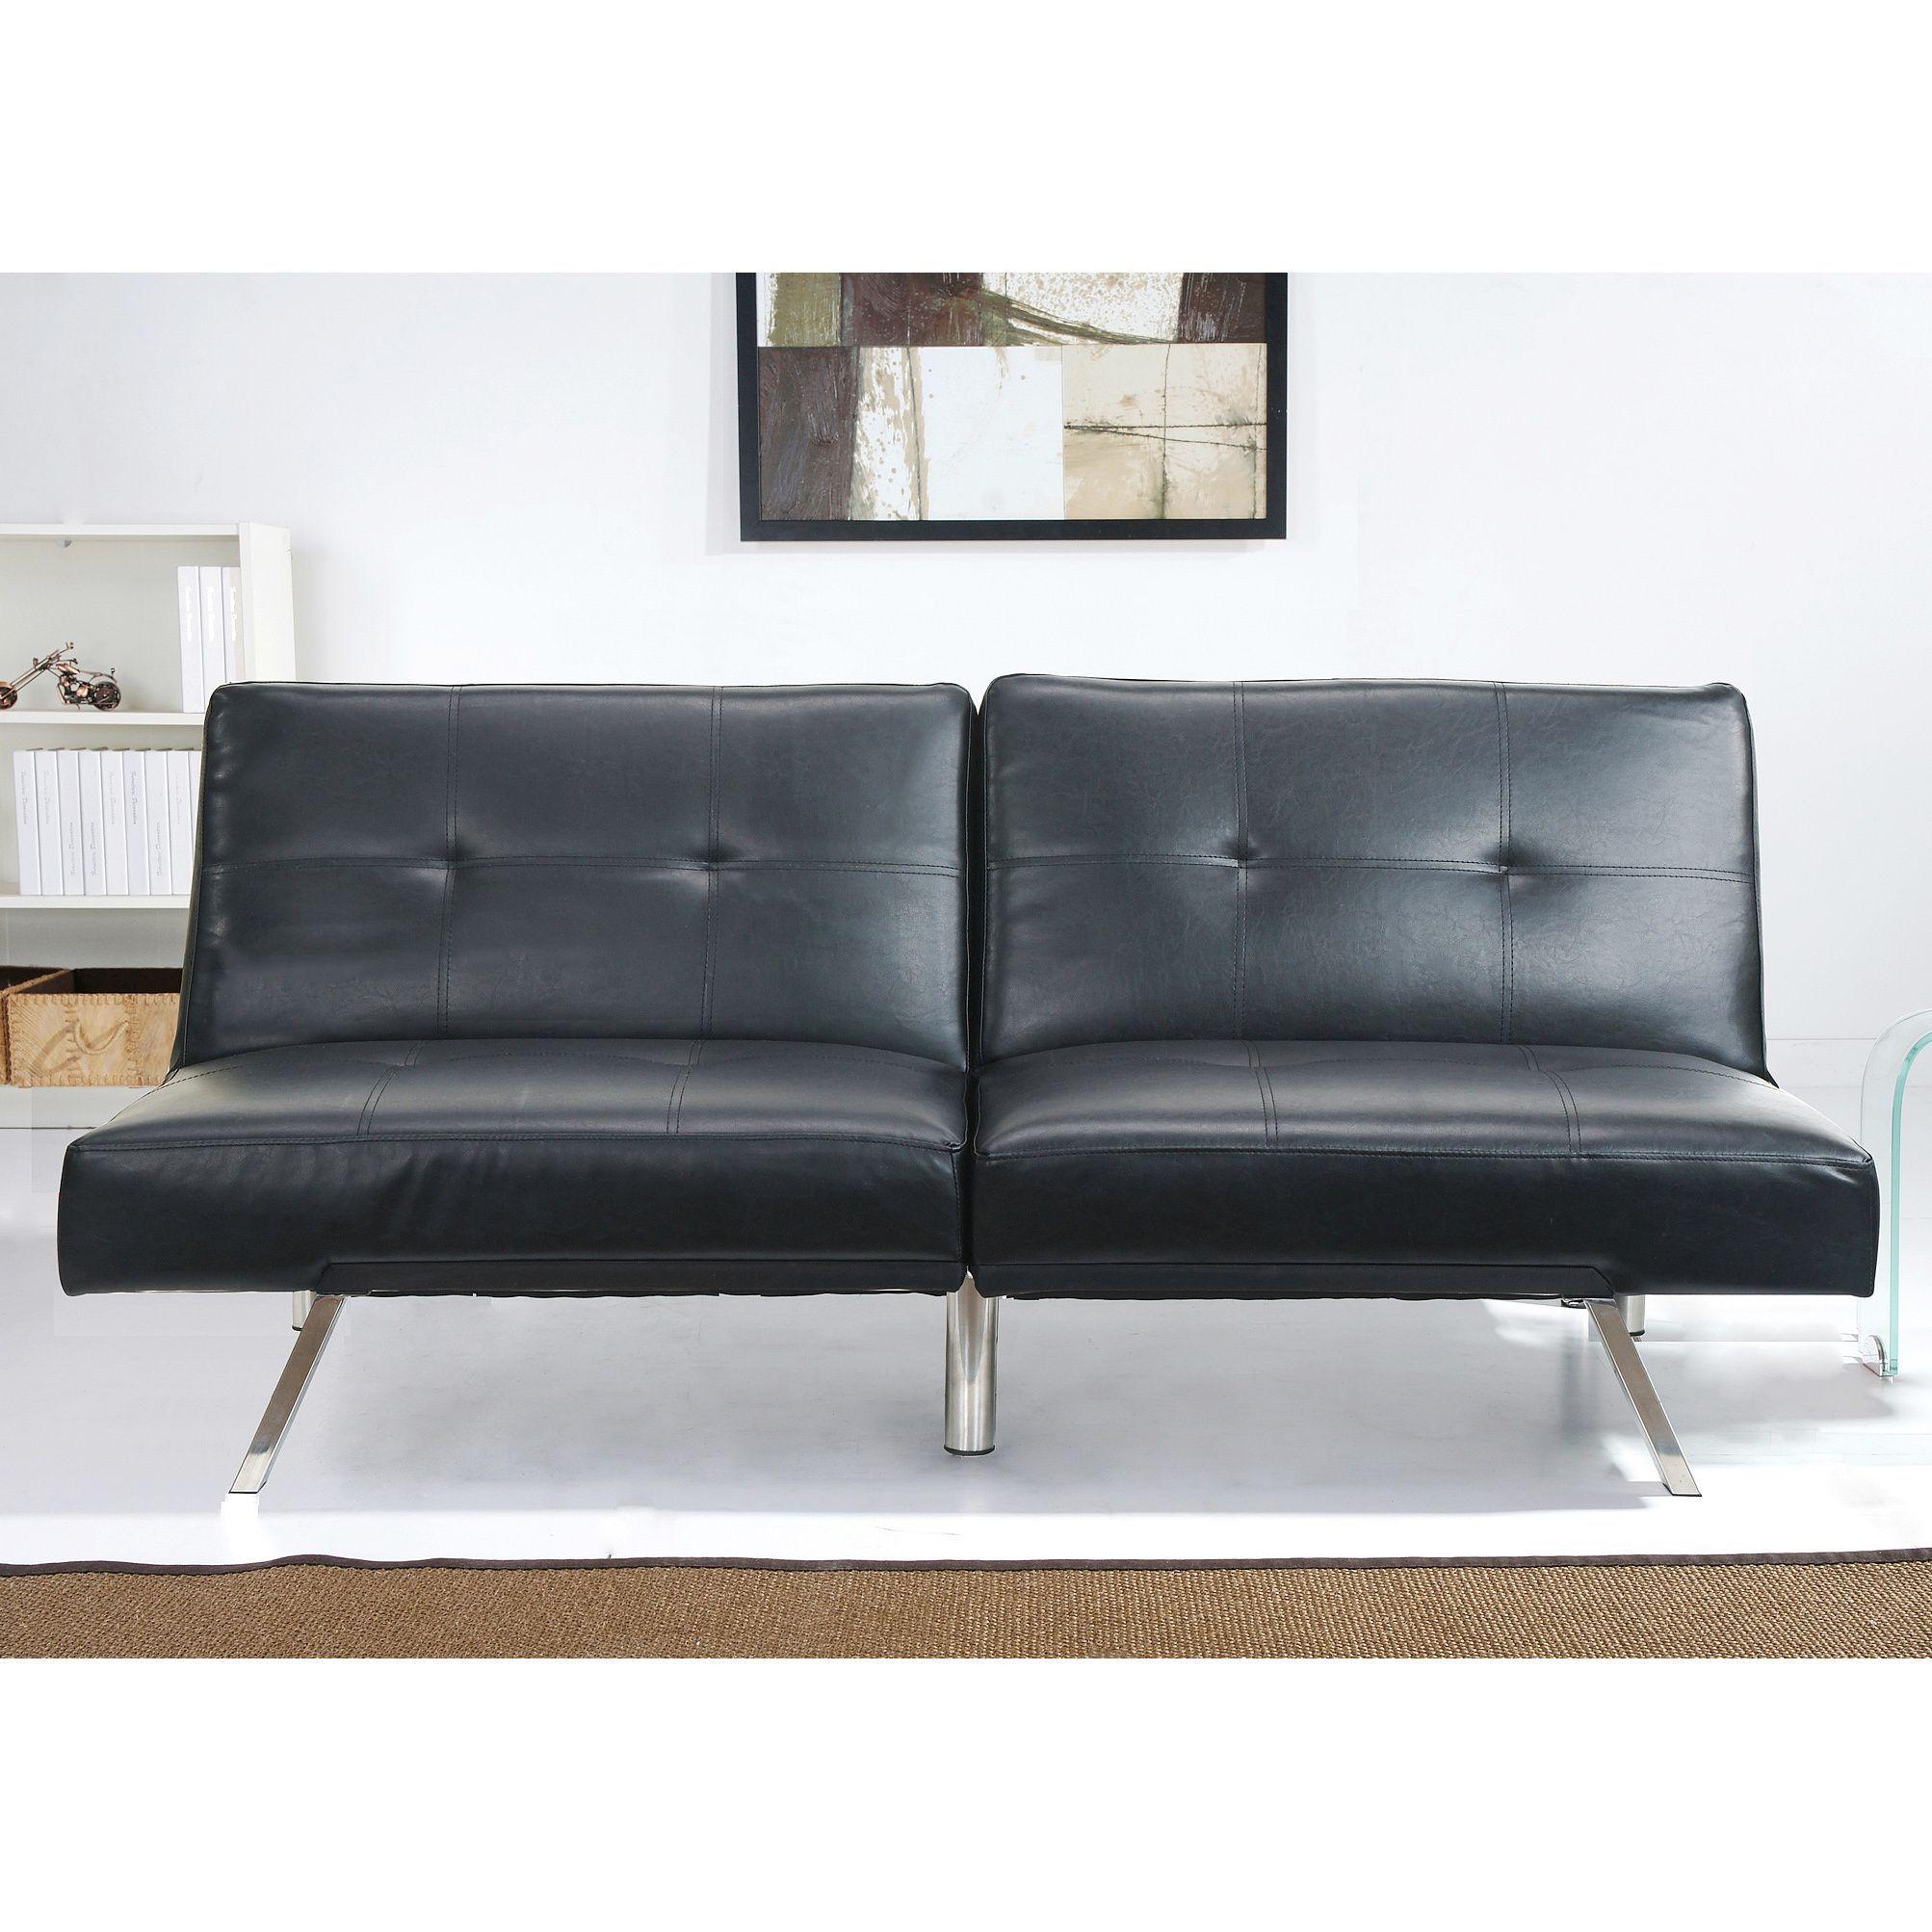 abbyson living aspen black leather foldable futon sleeper sofa bed rh pinterest com Modern Sectional Sofa Bed Chai Microsuede Sofa Bed